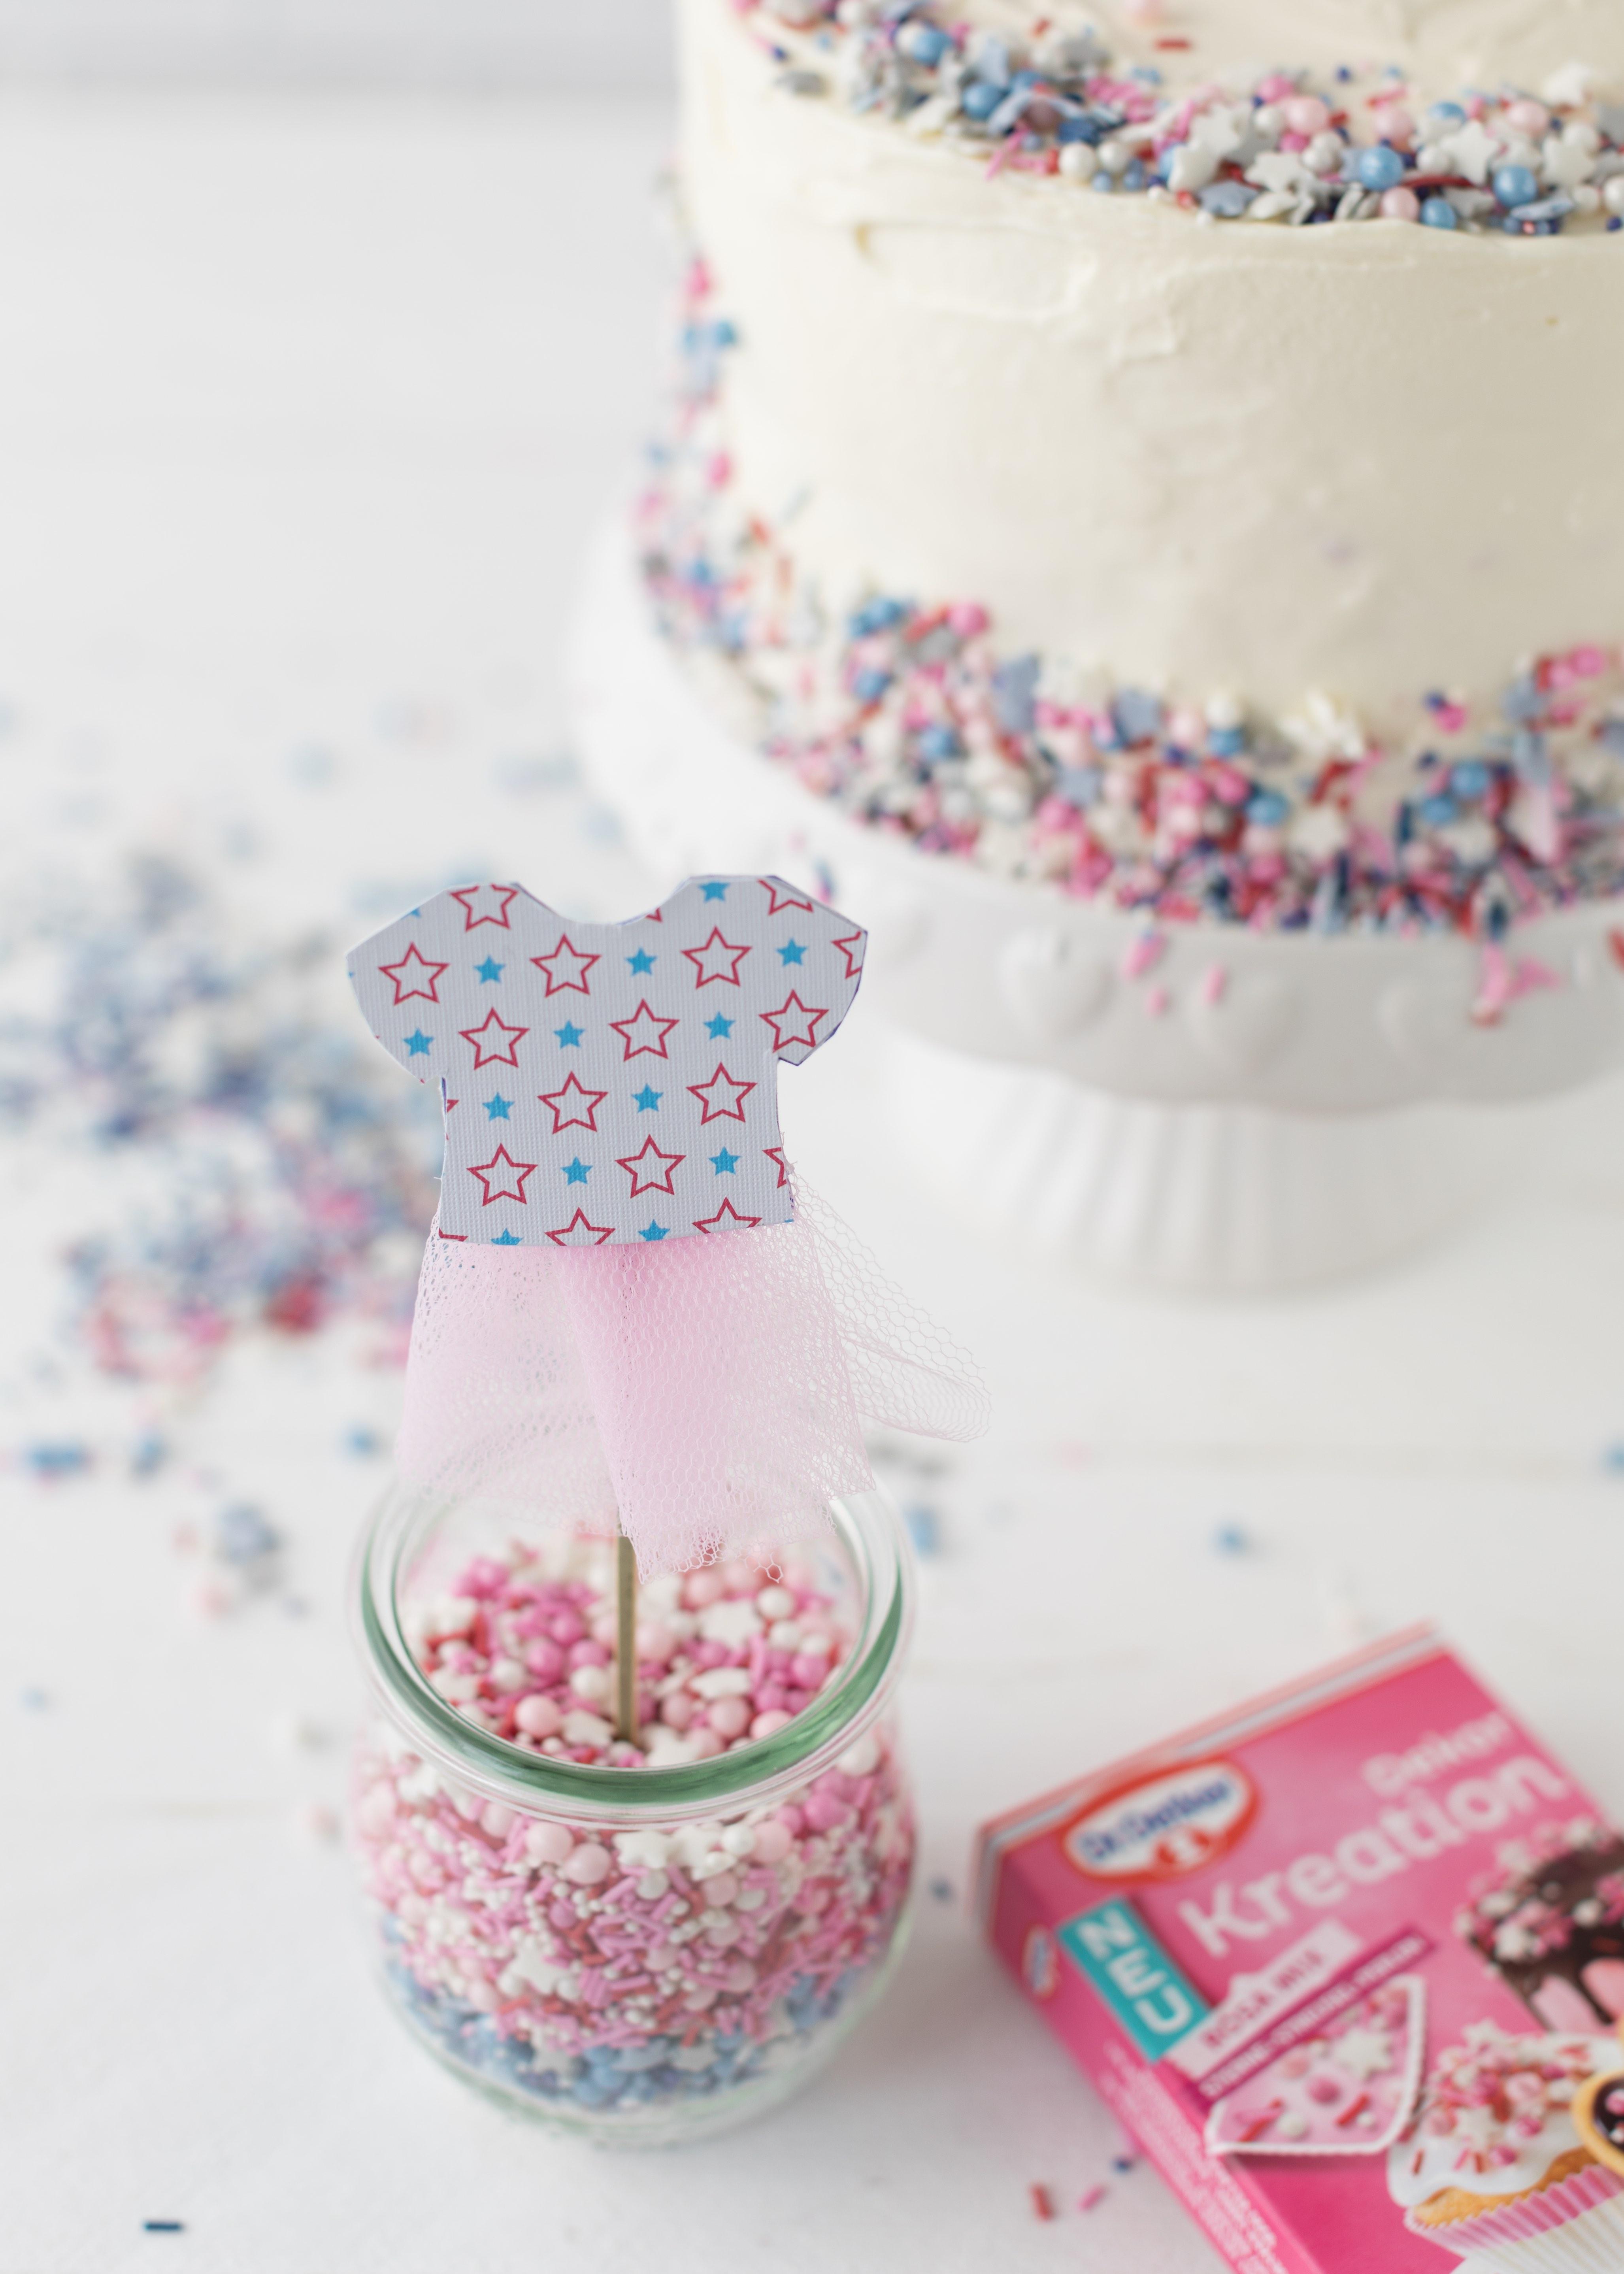 Werbung - Gender Reveal Cake Rezept Babyparty Babyshower Torte #babyshower #babyparty #genderreveal #torte #cake #backen | Emma´s Lieblingsstücke